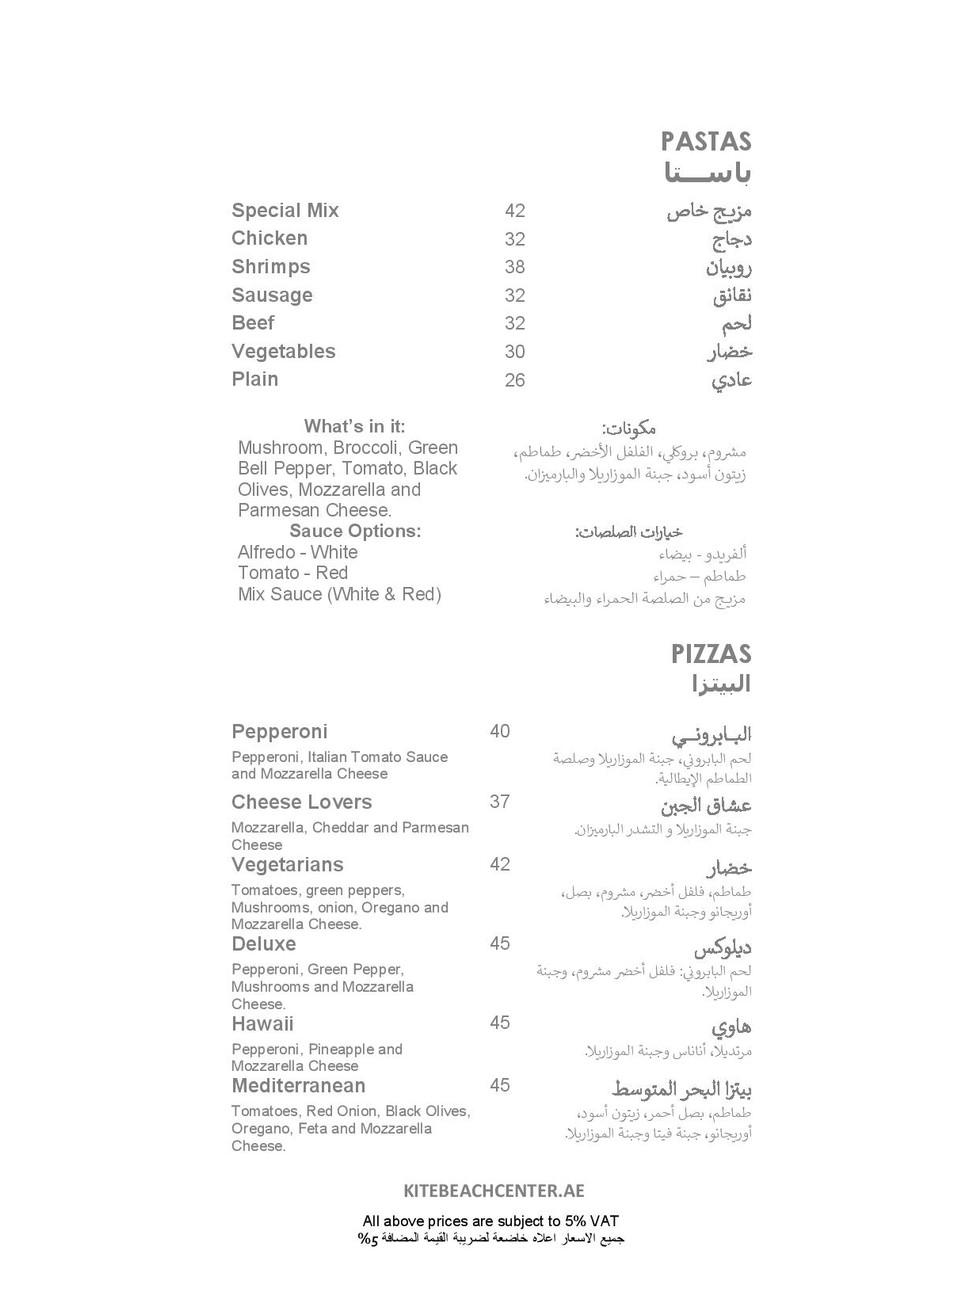 PIZZA PASTA neww-page-001.jpg